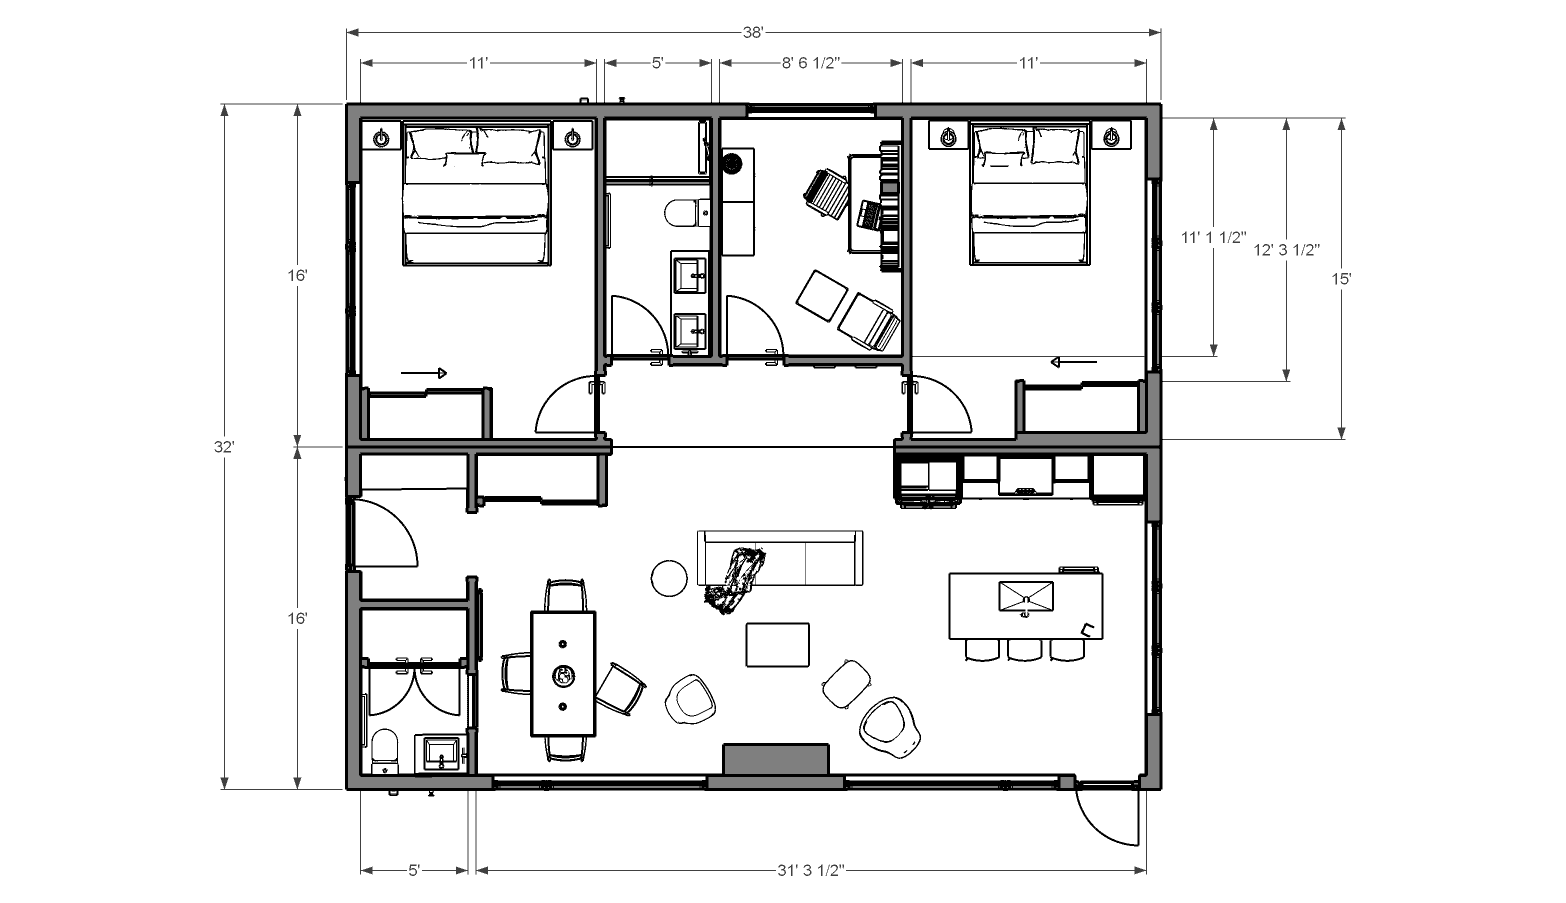 Prefab Modular Homes | Western Canada | Built Indoors | Built Prefab